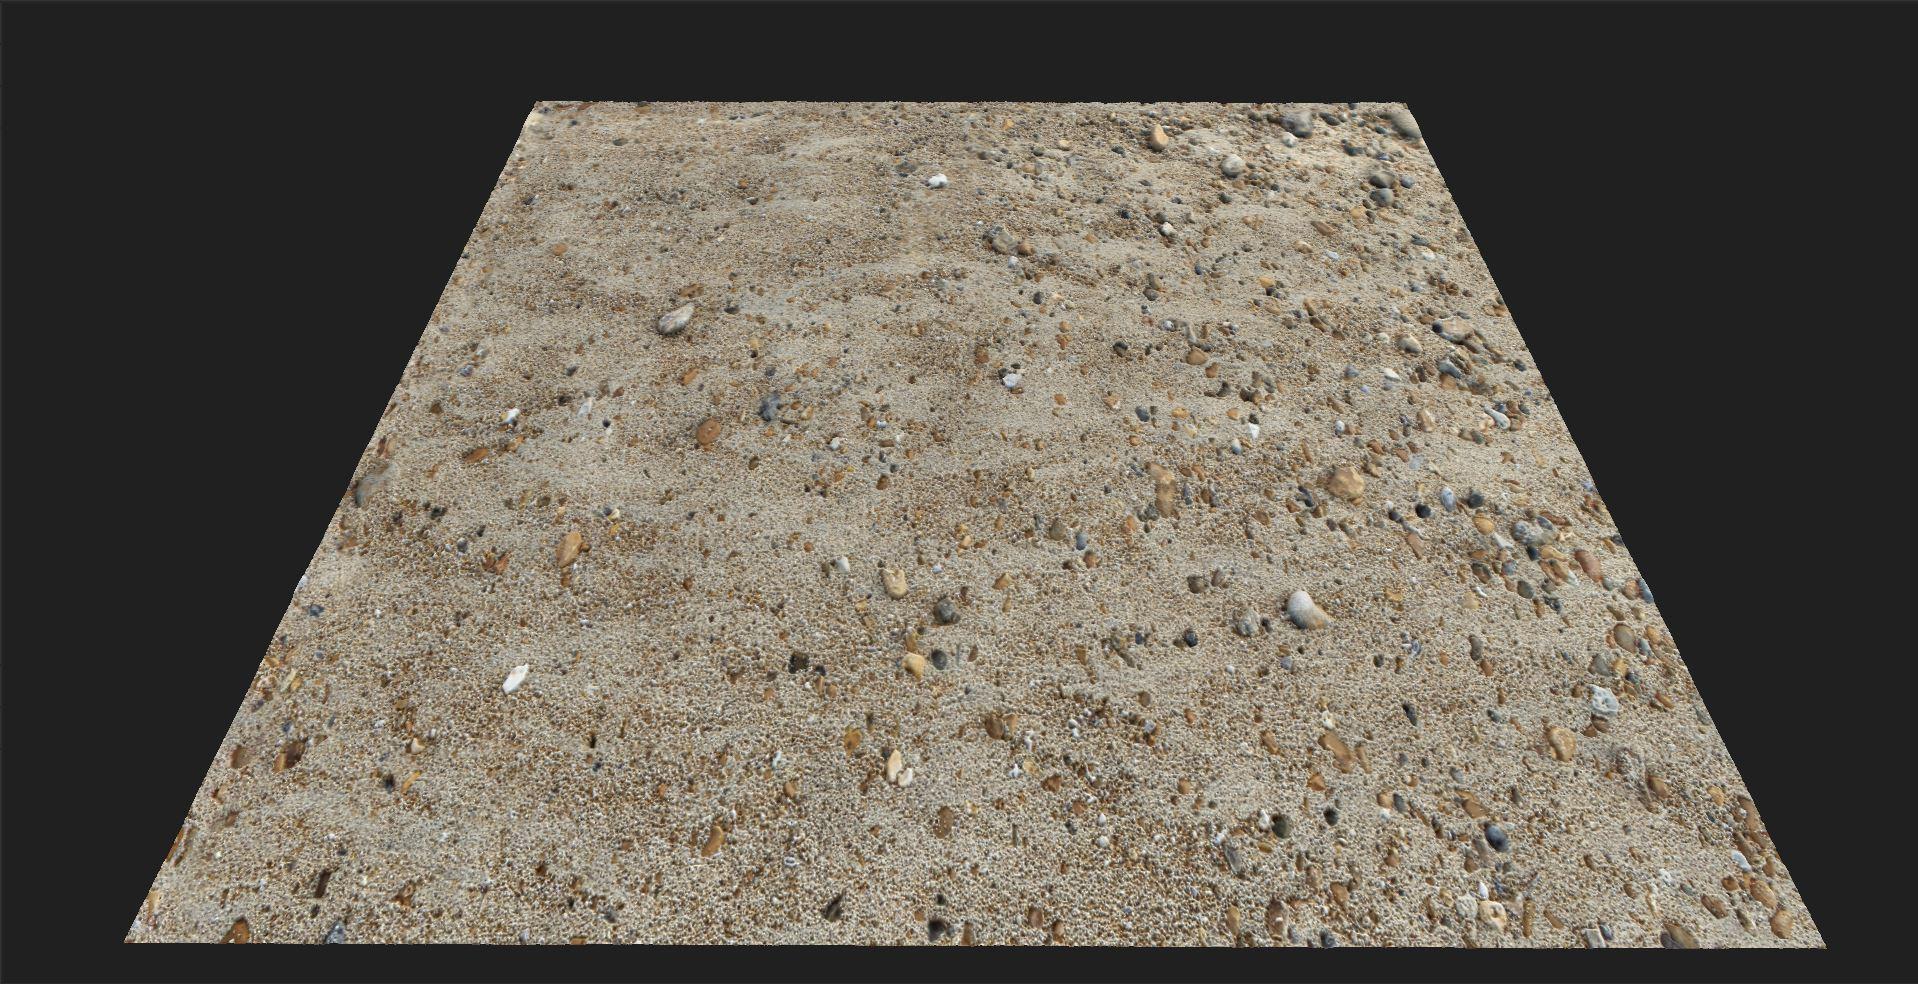 Sand_02